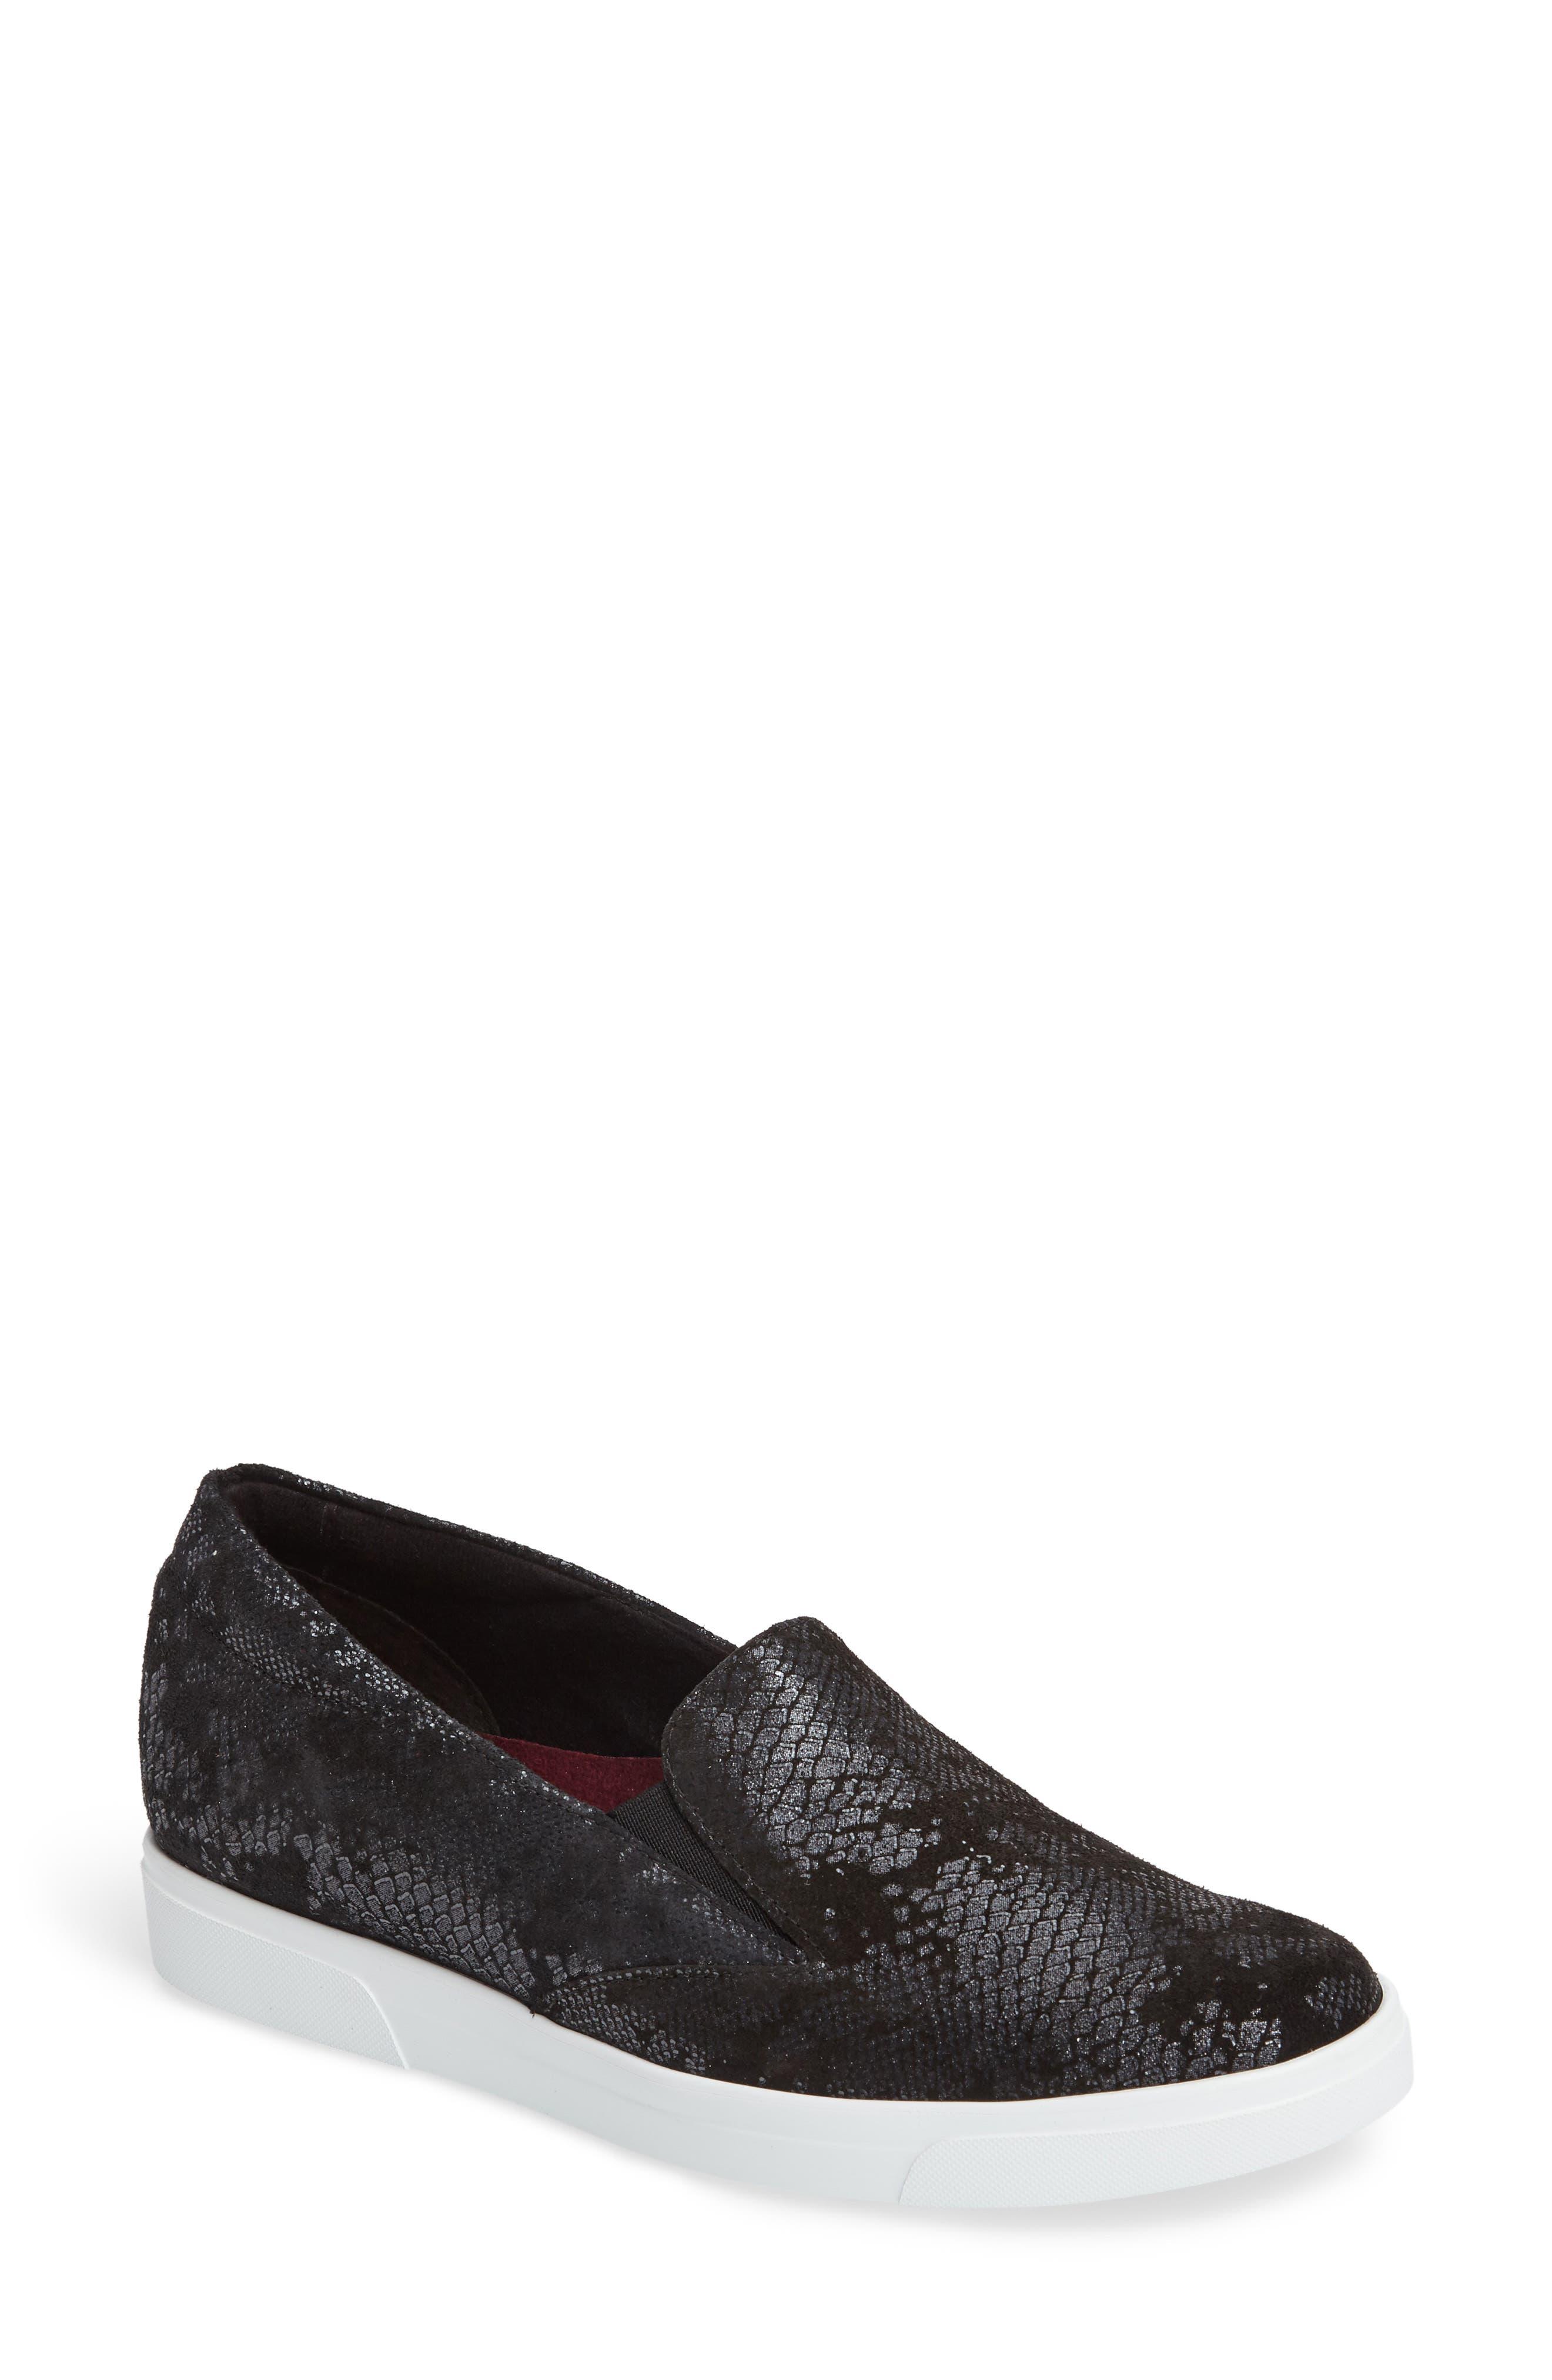 Alternate Image 1 Selected - Munro Lulu Slip-On Sneaker (Women)